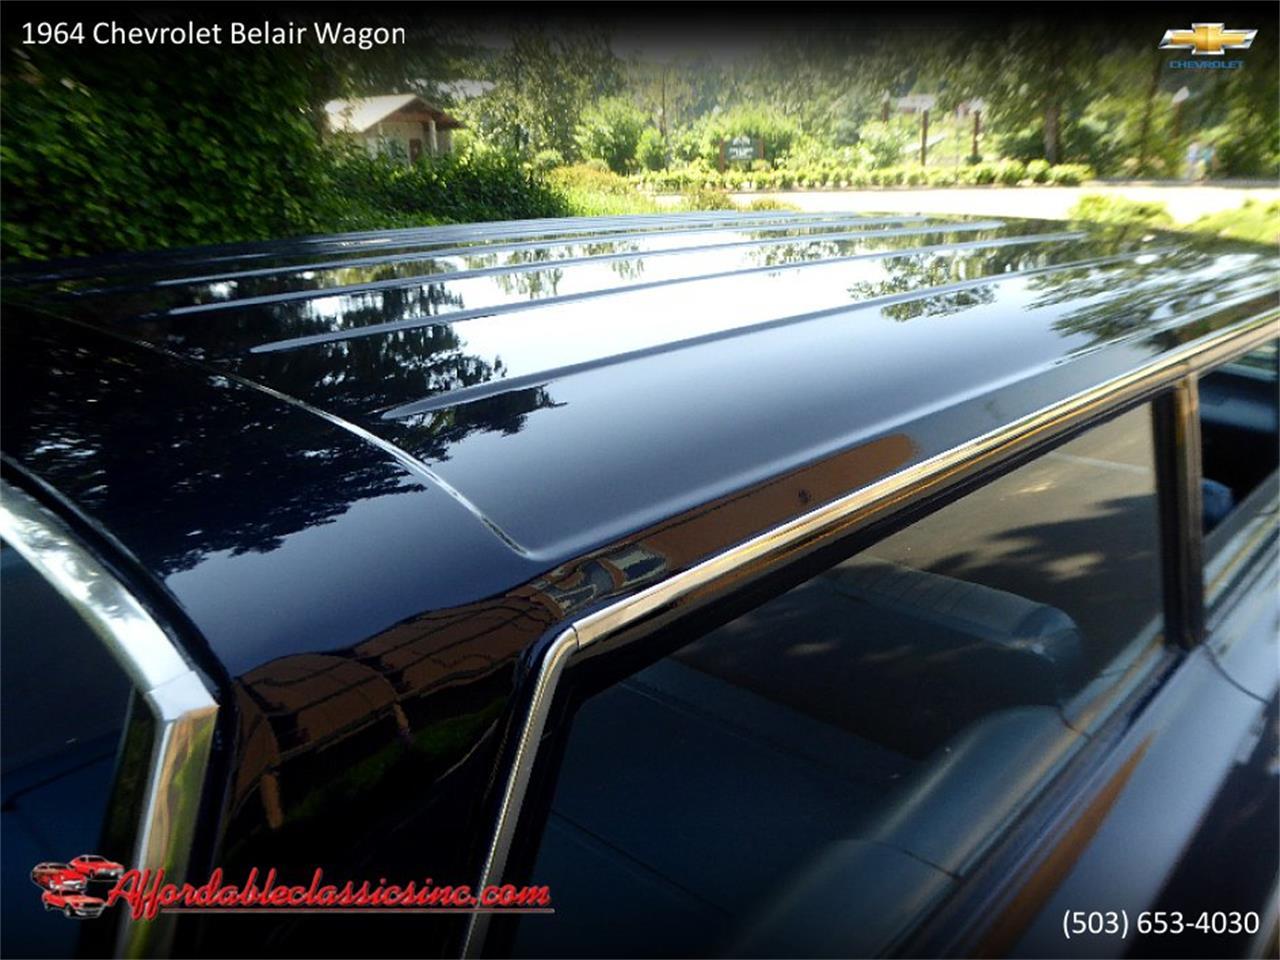 1964 Chevrolet Bel Air (CC-1225954) for sale in Gladstone, Oregon